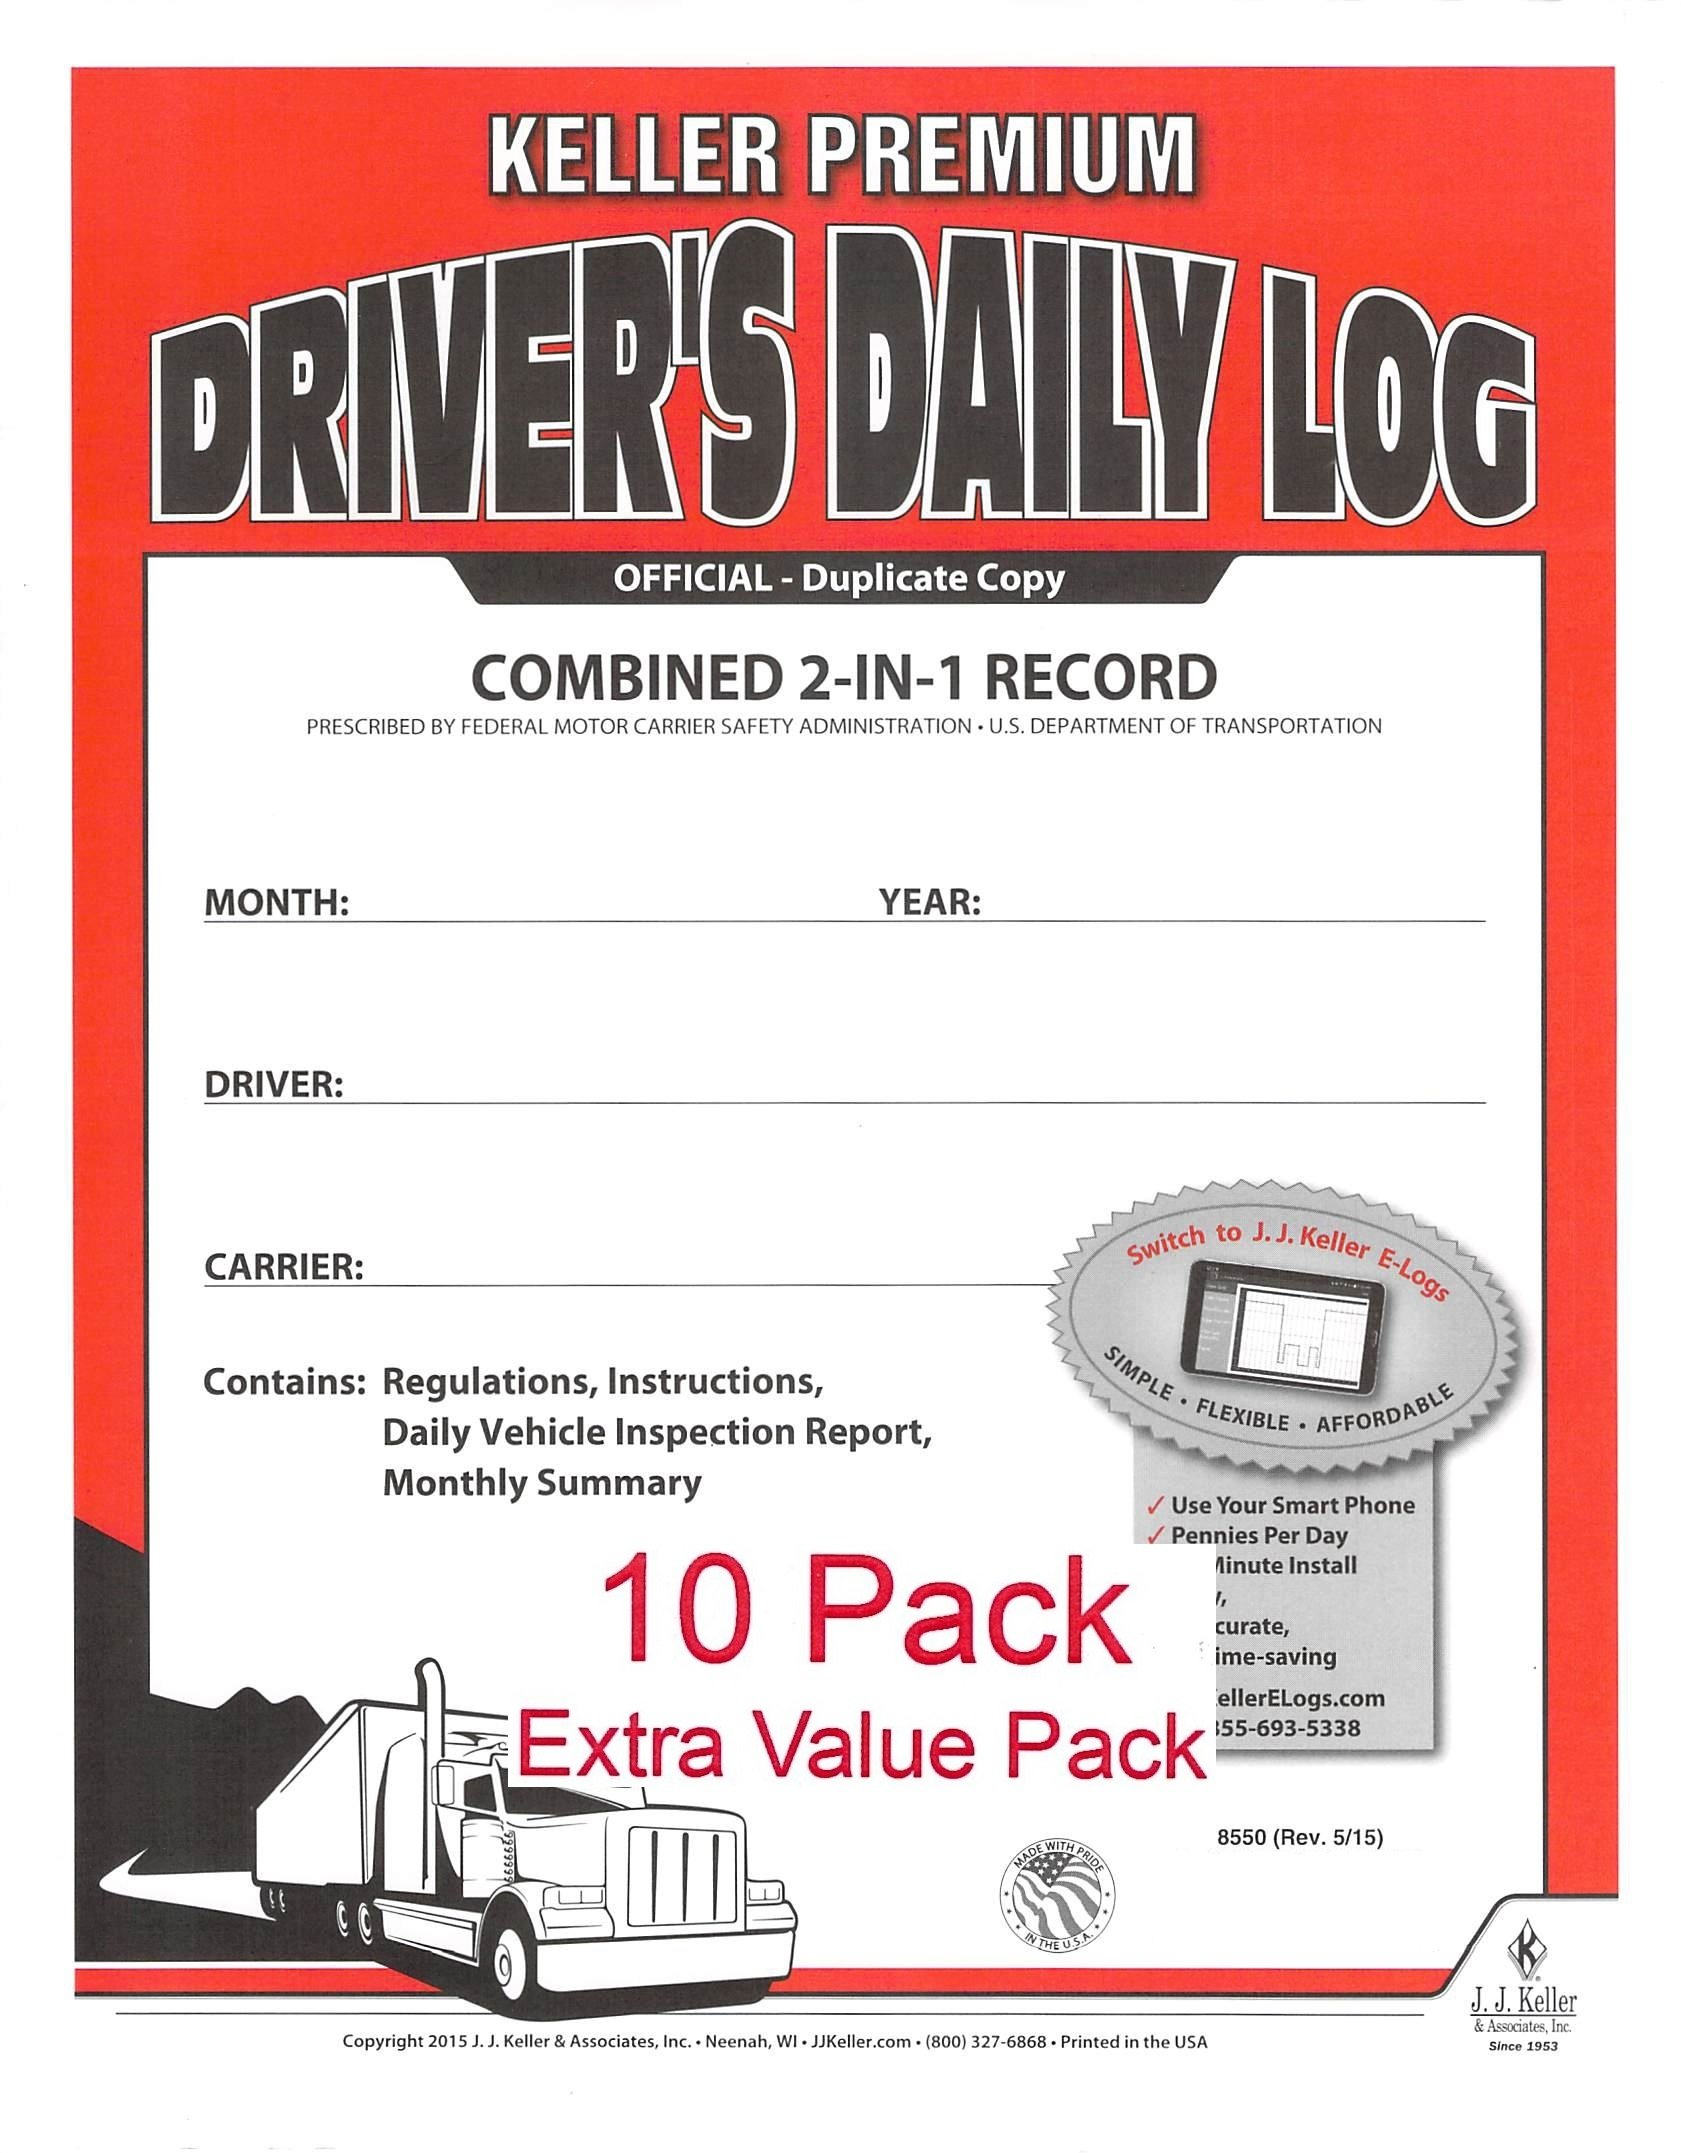 J.J. Keller 8550 (605L) 2-In-1 Driver's Daily Log Book w/Detailed DVIR, 2-Ply, w/Carbon, No Recap - Pack of 10 by J. J. Keller